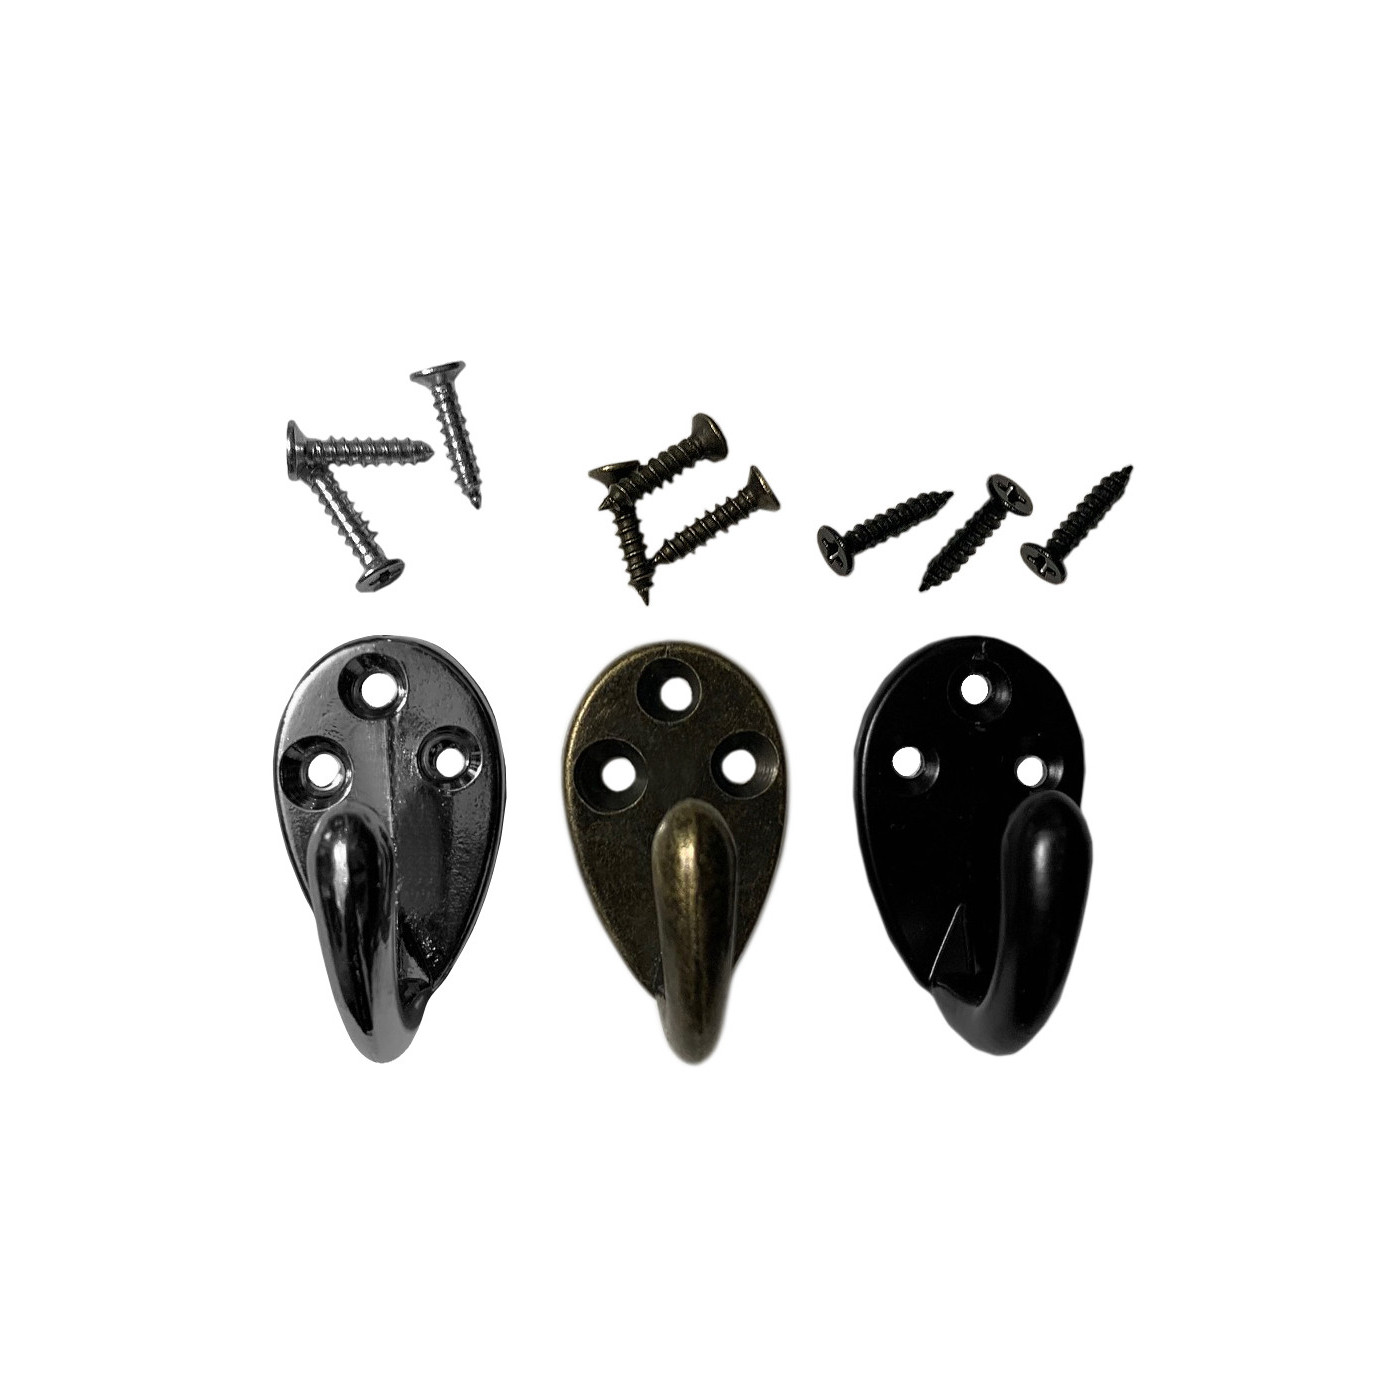 Set of 6 small metal clothes hooks, coat hangers (color: bronze)